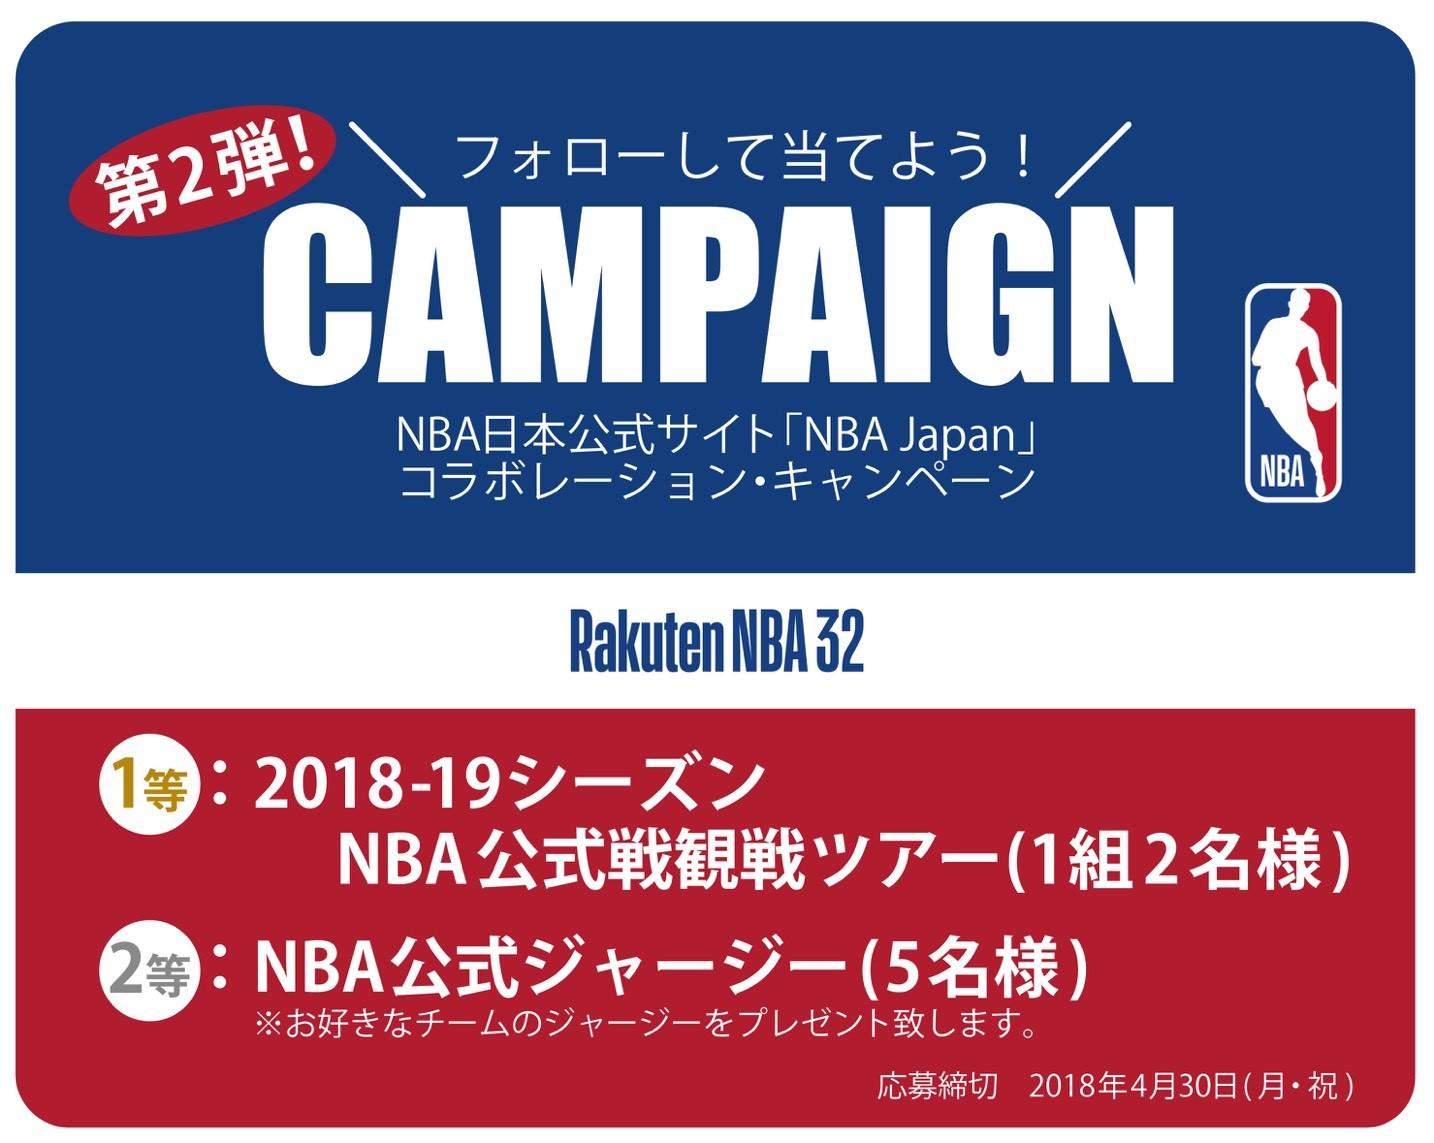 Rakuten NBA 32 Campaign